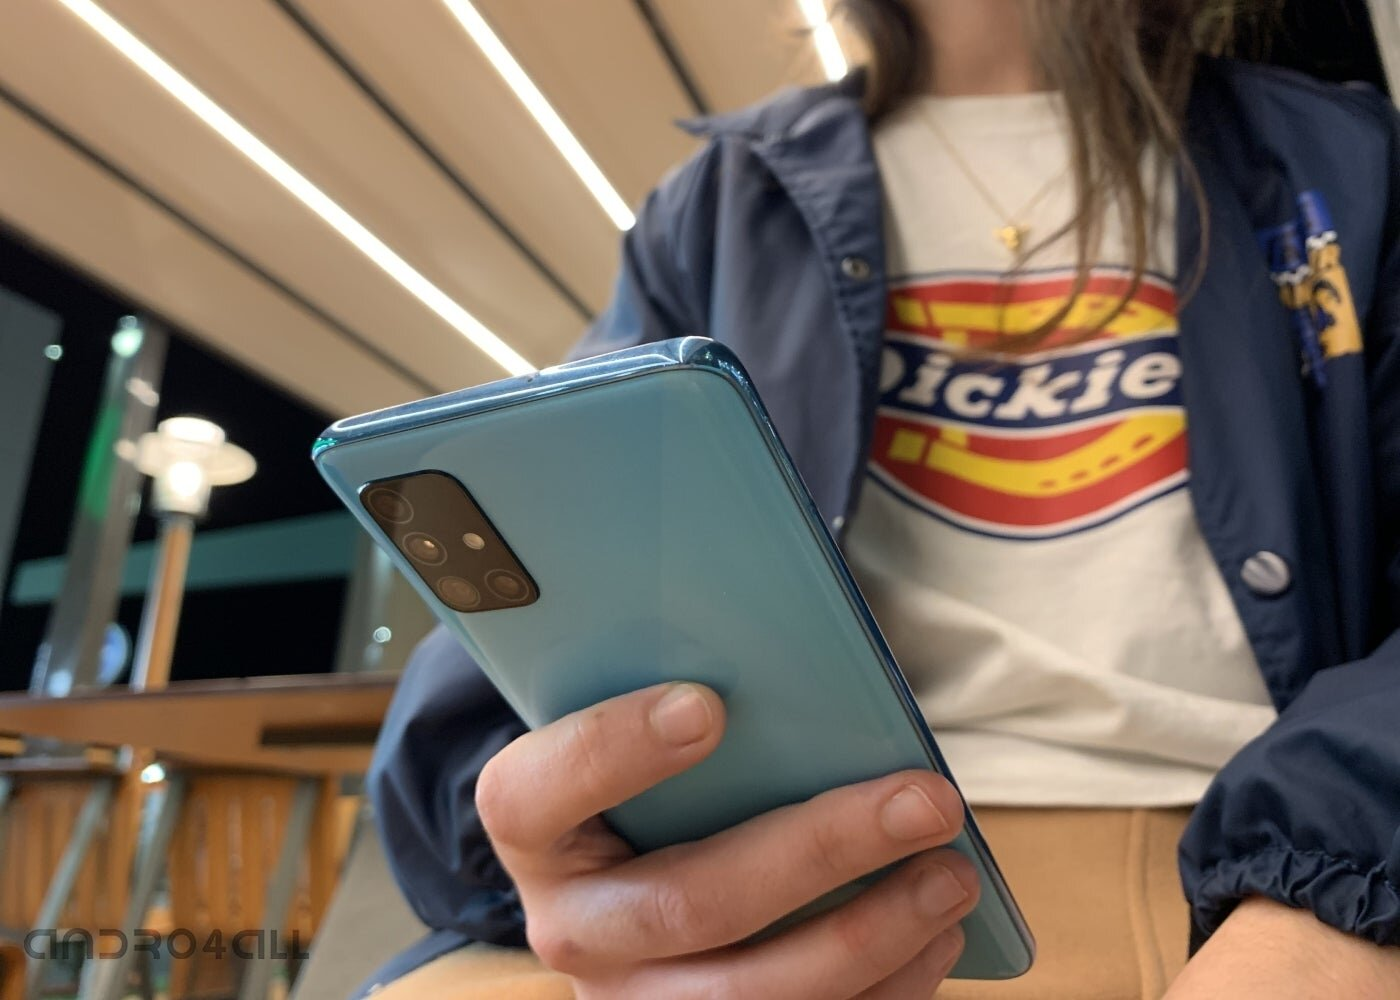 Arrière Samsung Galaxy A51 en main